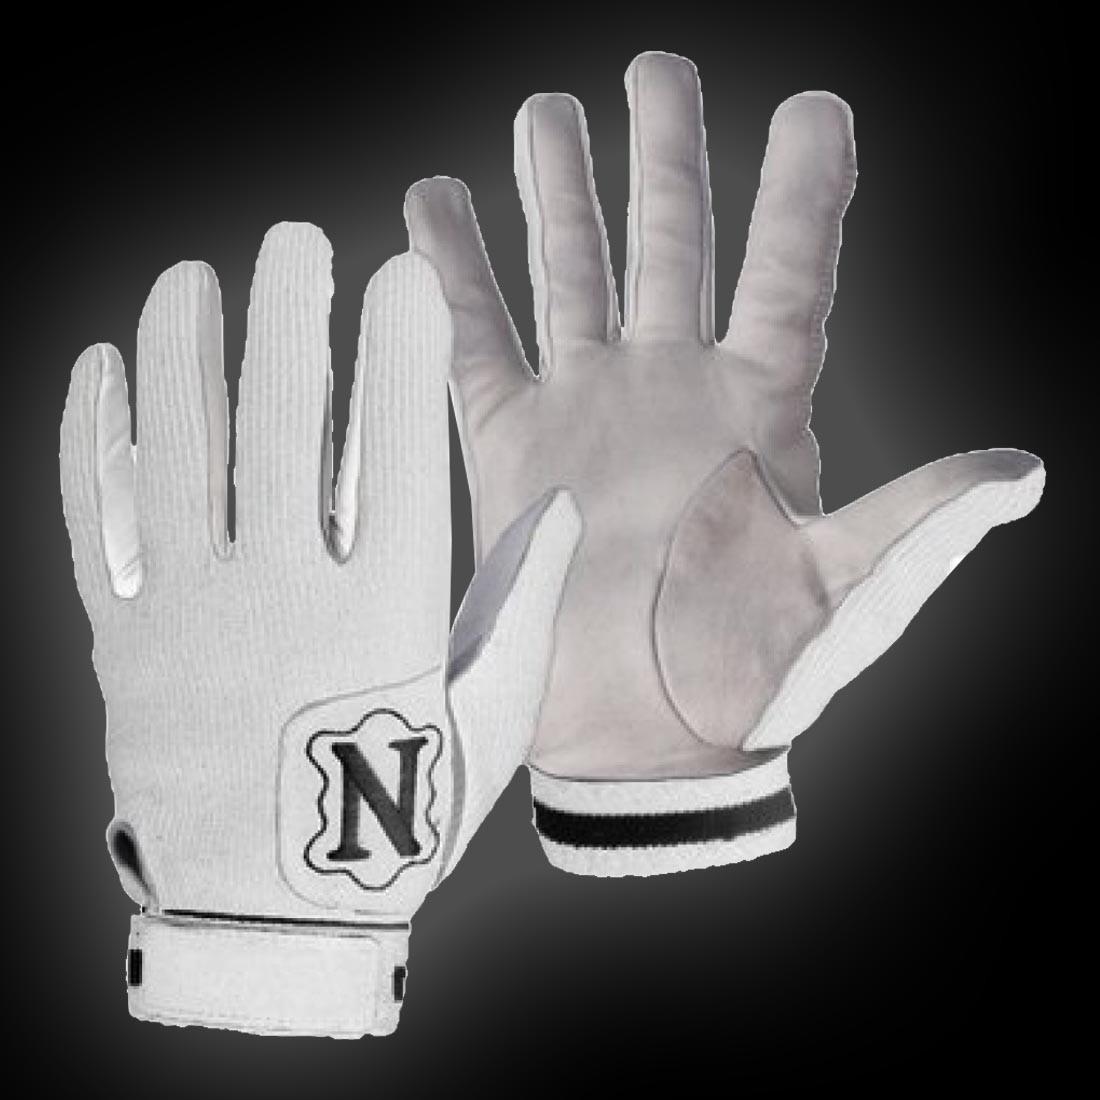 Gants de gardien Neumann blanc